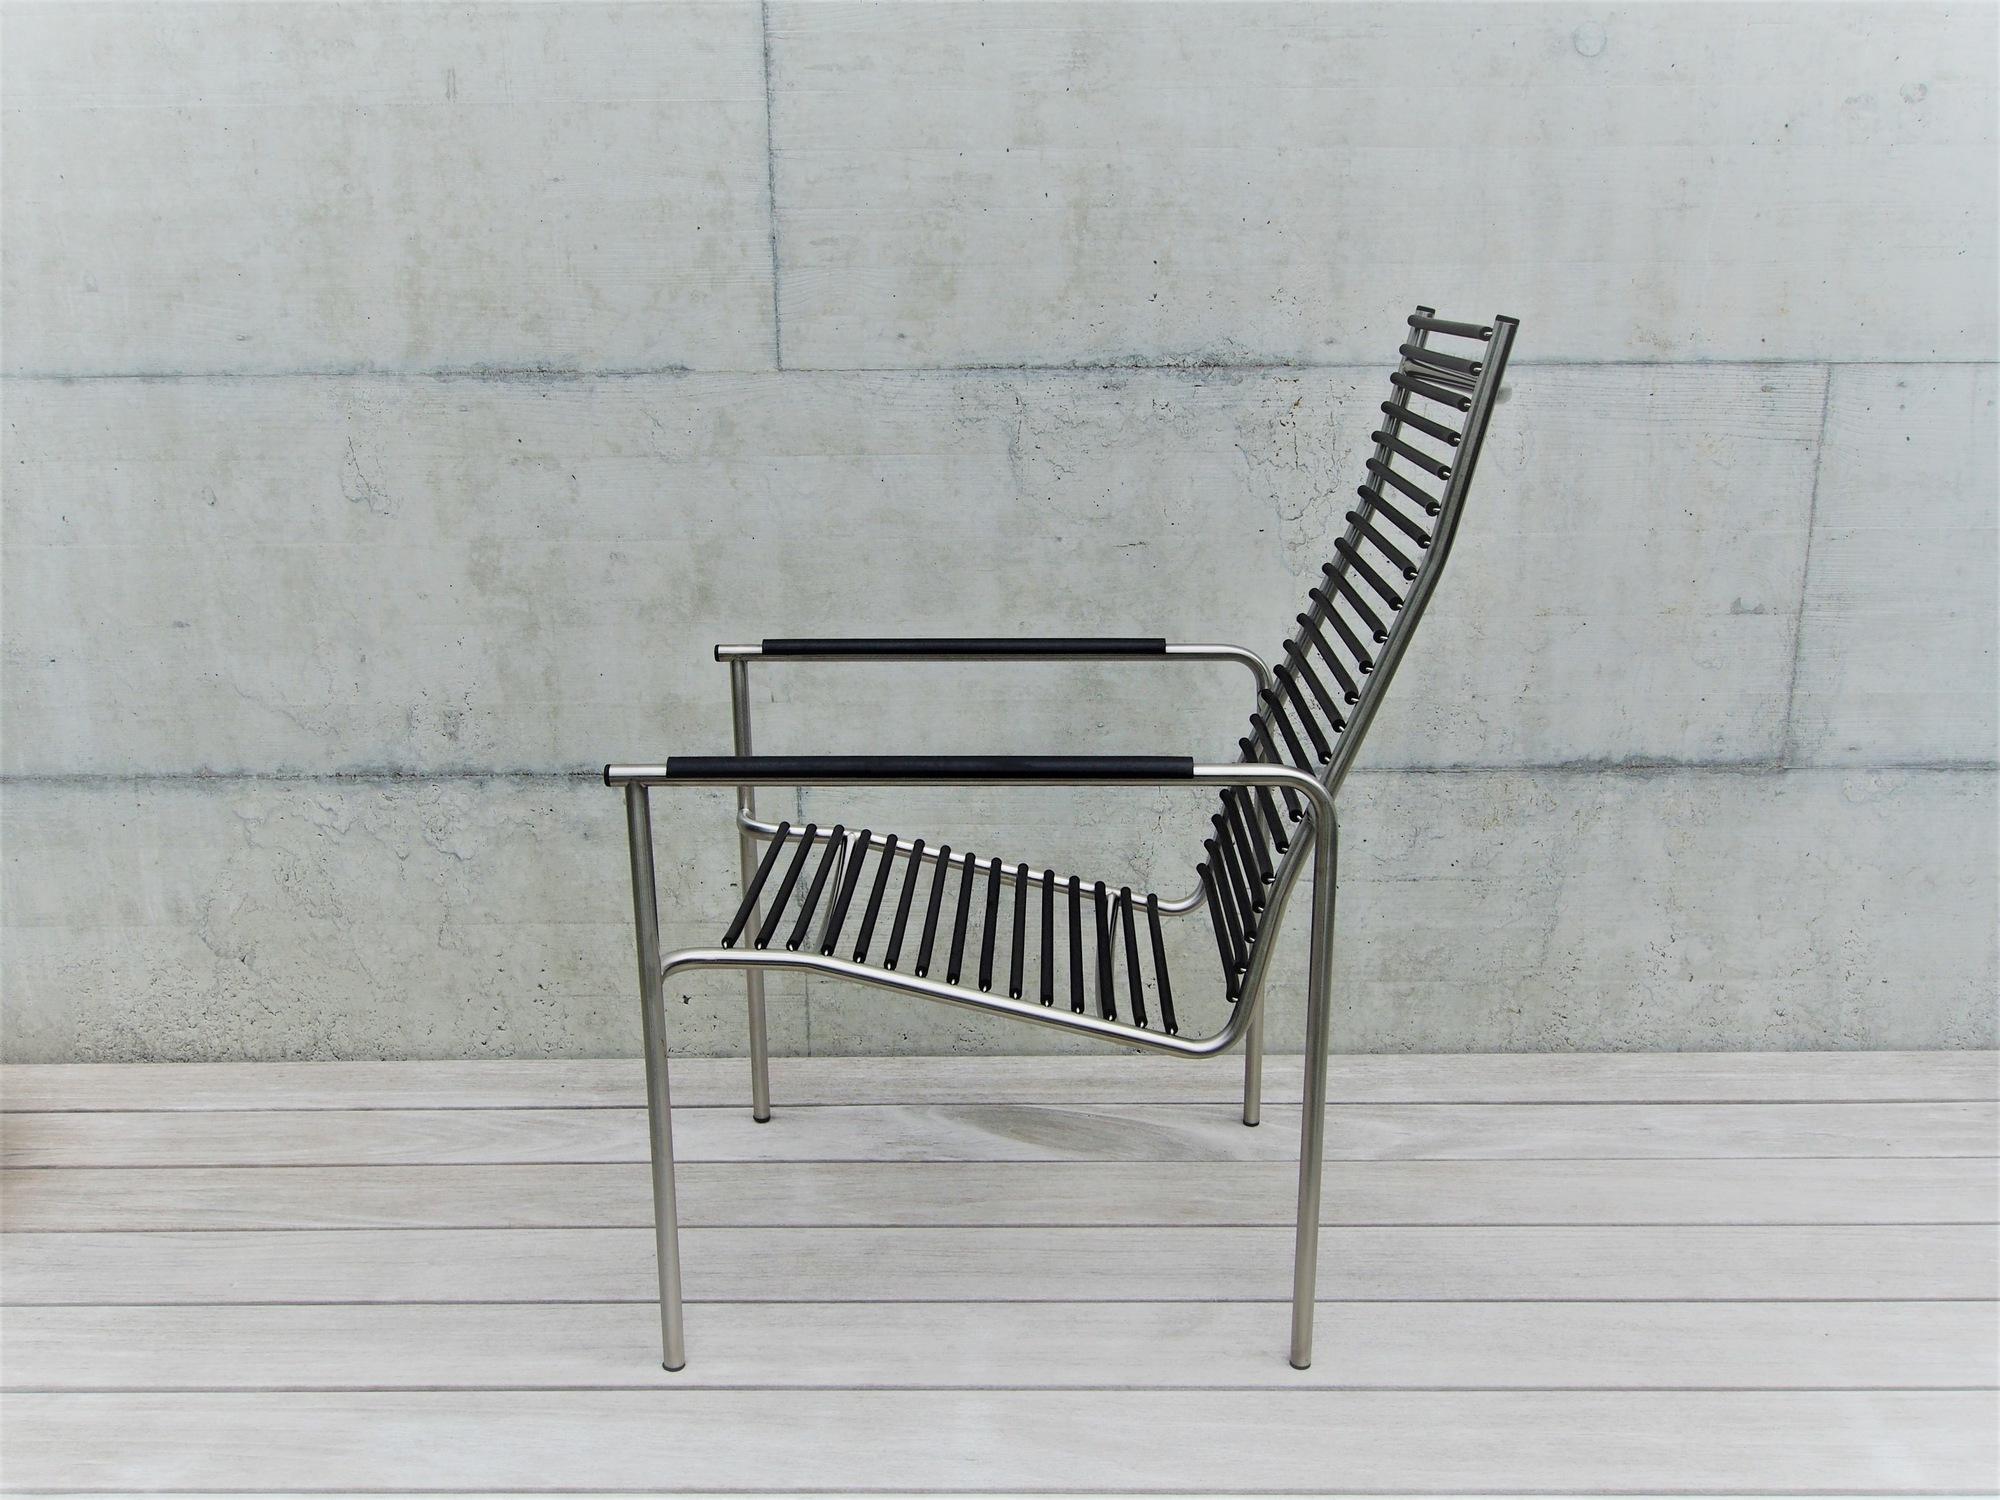 1531834168-gartenmoebel-clone-fauteuil-julia_1.jpg